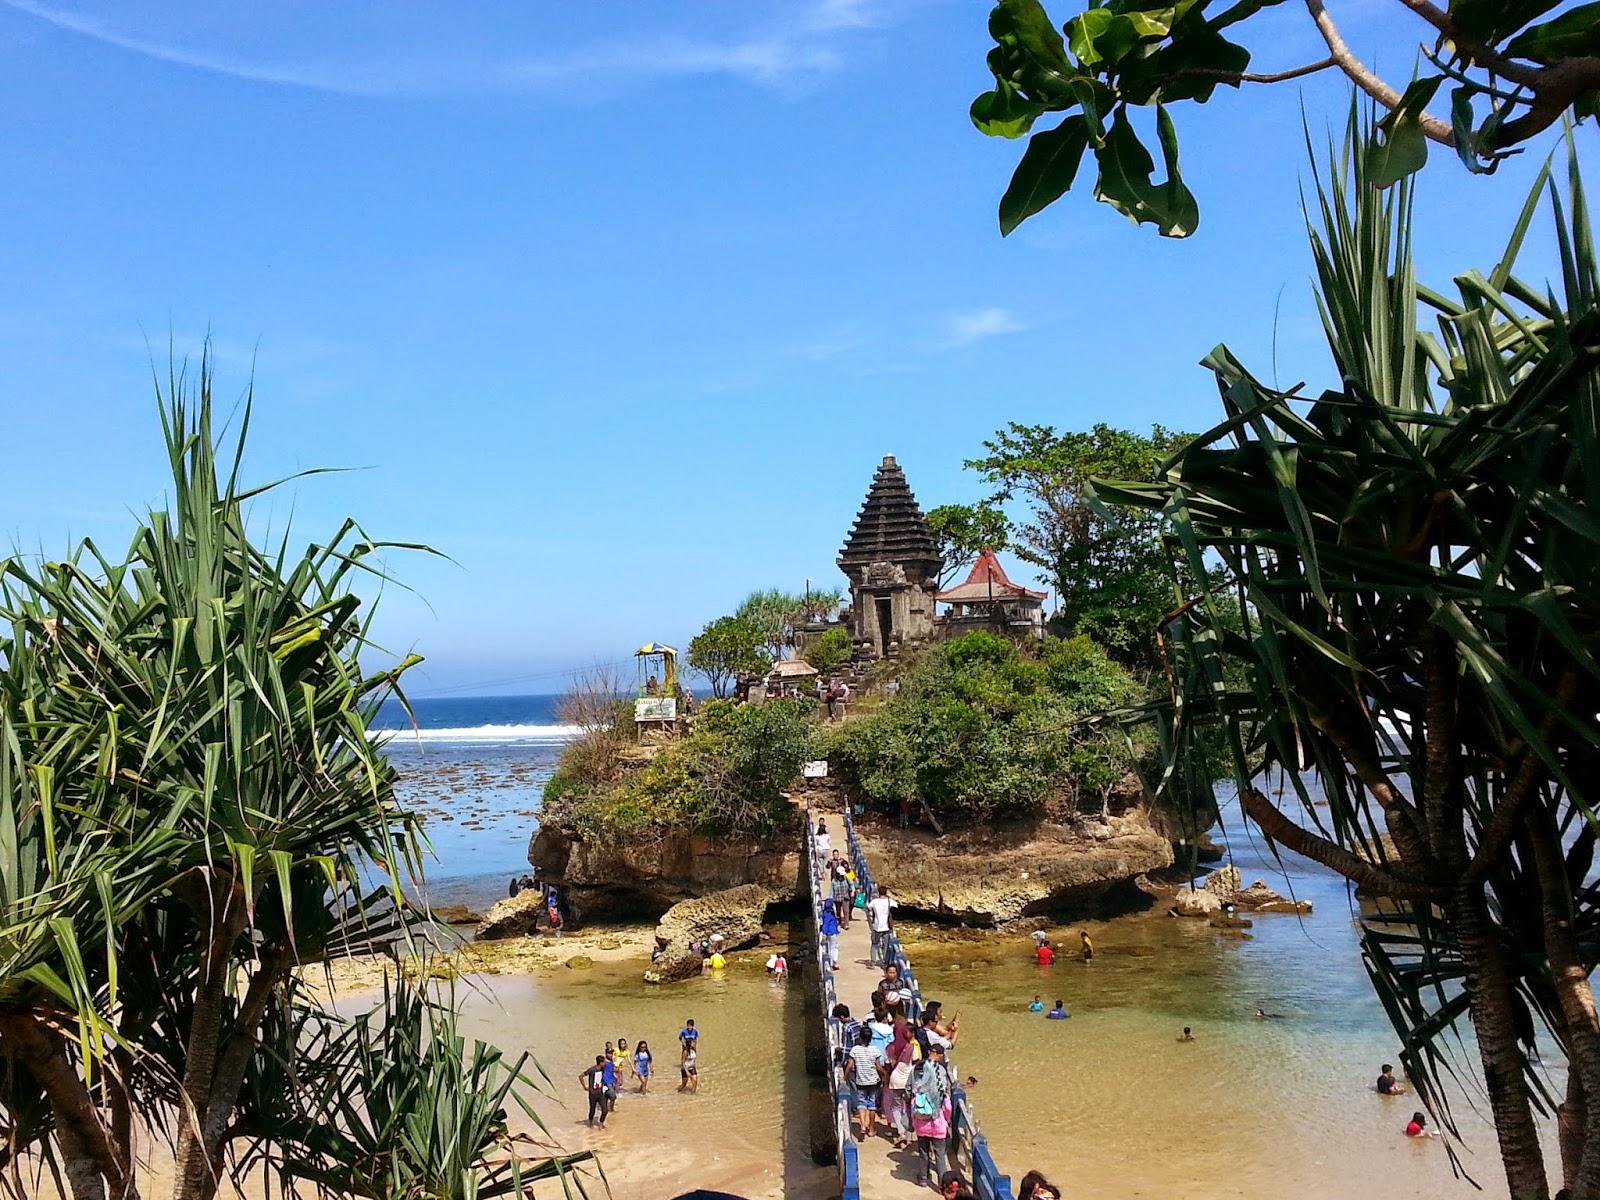 Pantai Ngliyep, Berwisata Sambil Menikmati Matahari Tenggelam